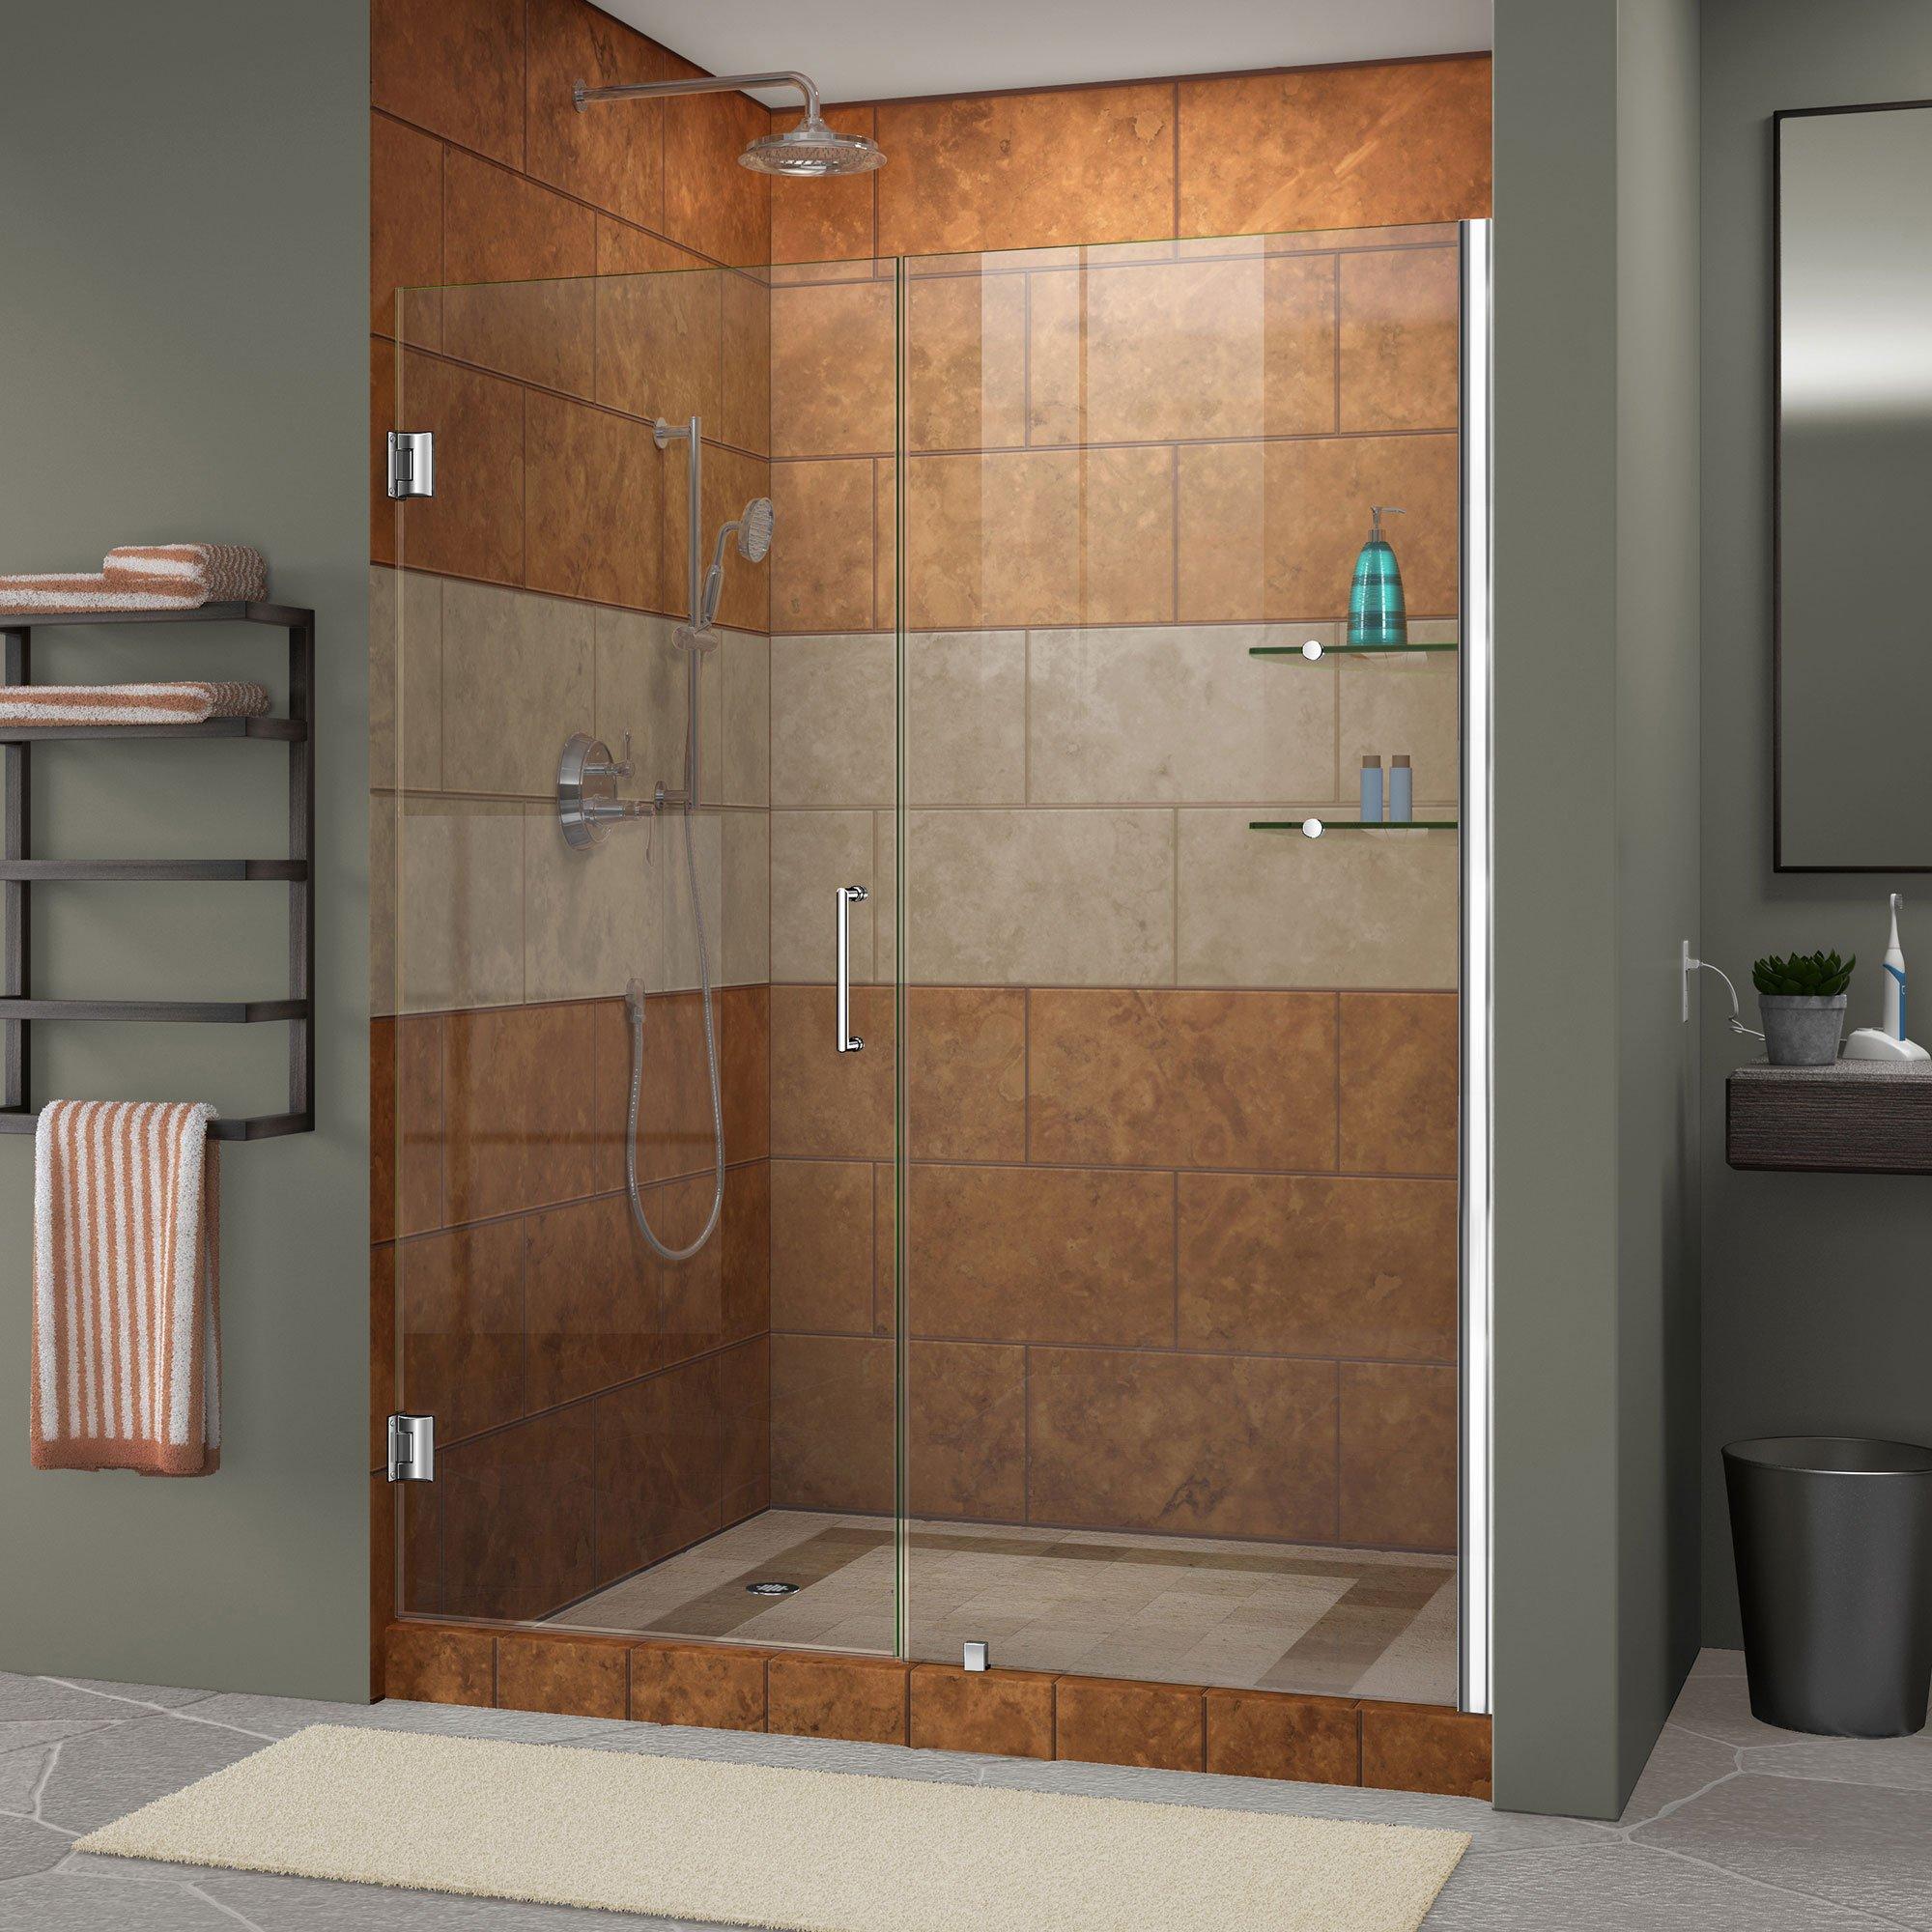 DreamLine Unidoor 53-54 in. Width, Frameless Hinged Shower Door, 3/8'' Glass, Chrome Finish